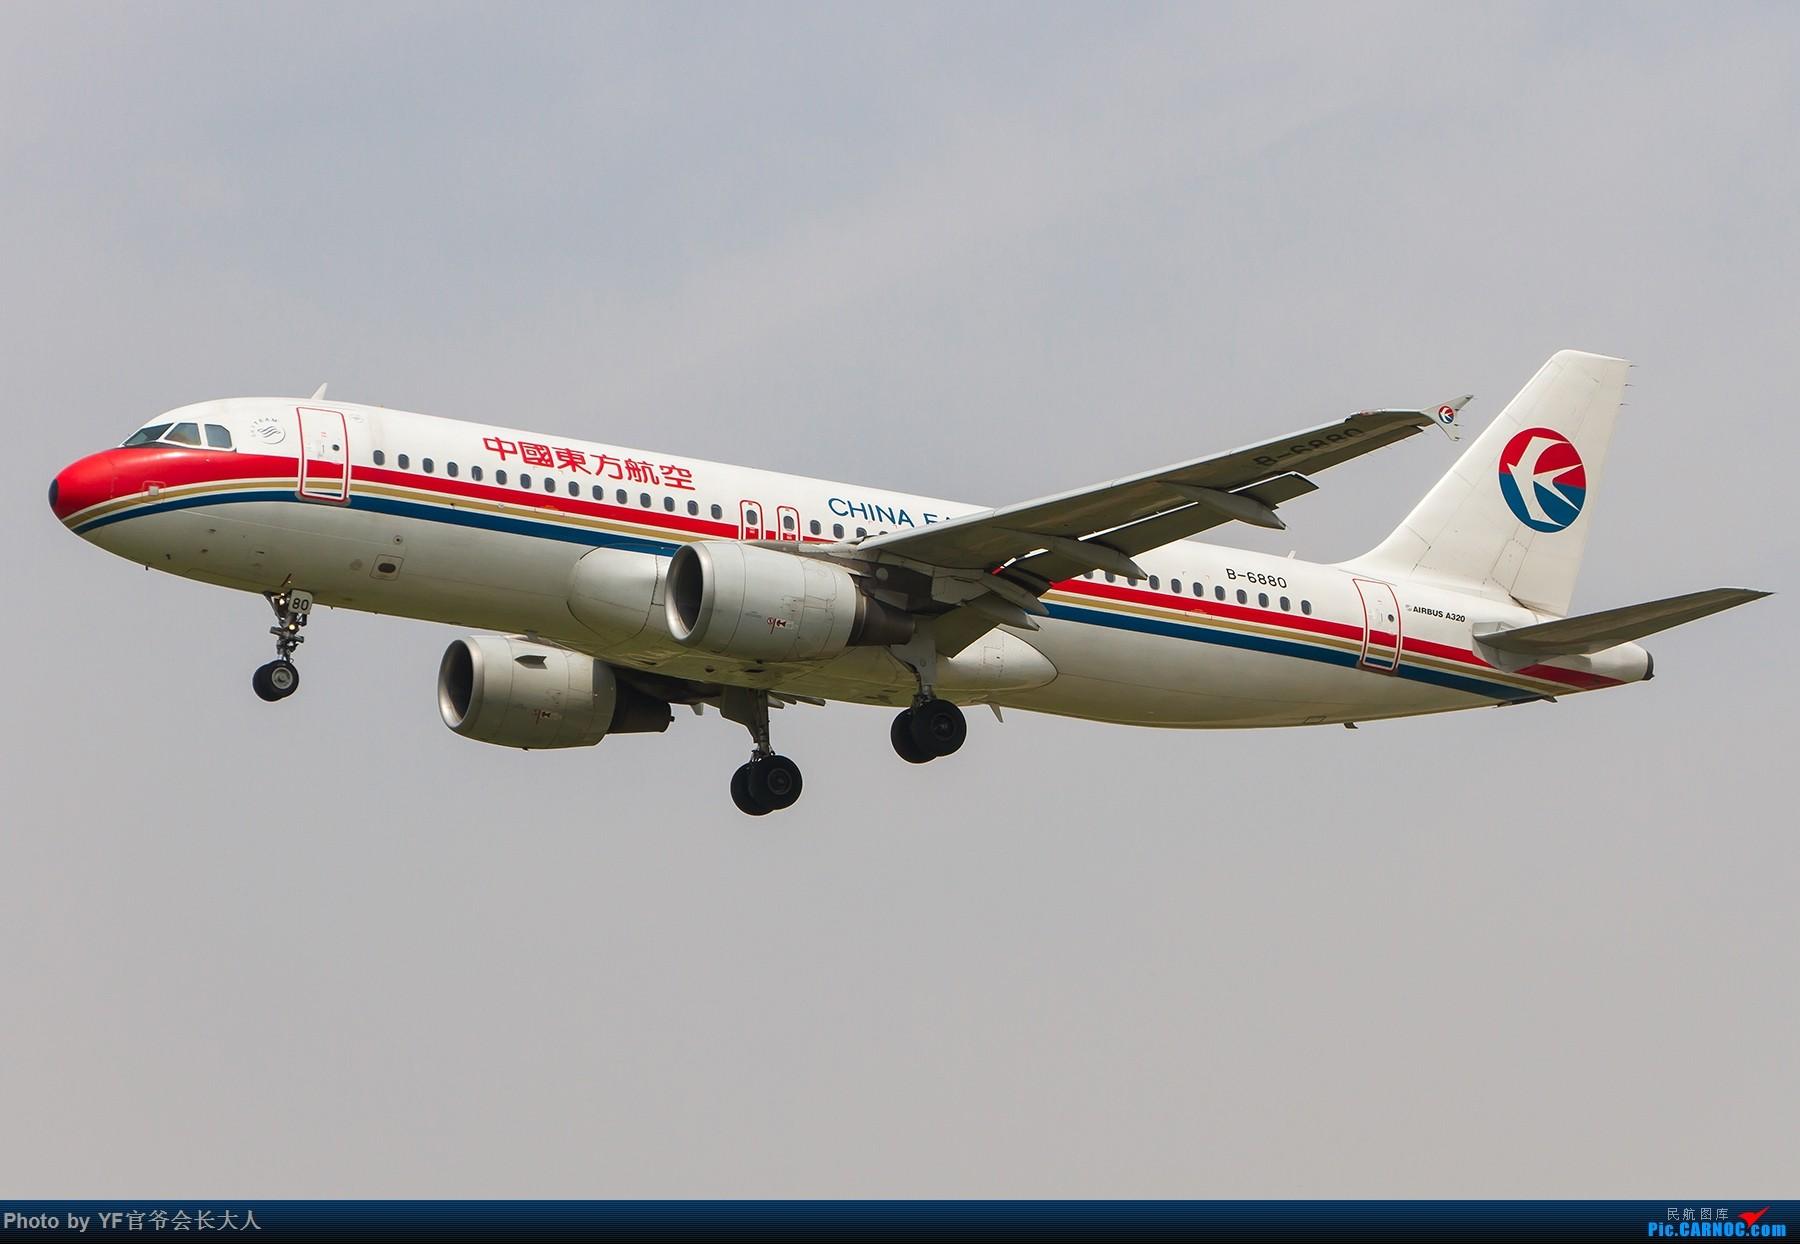 Re:[原创]【ZYTX】轻易不拍机,拍就要拍个过瘾!(新开的酷鸟,亚洲大西洋,顺带碰上朝韩两国的好货) AIRBUS A320-200 B-6880 中国沈阳桃仙国际机场